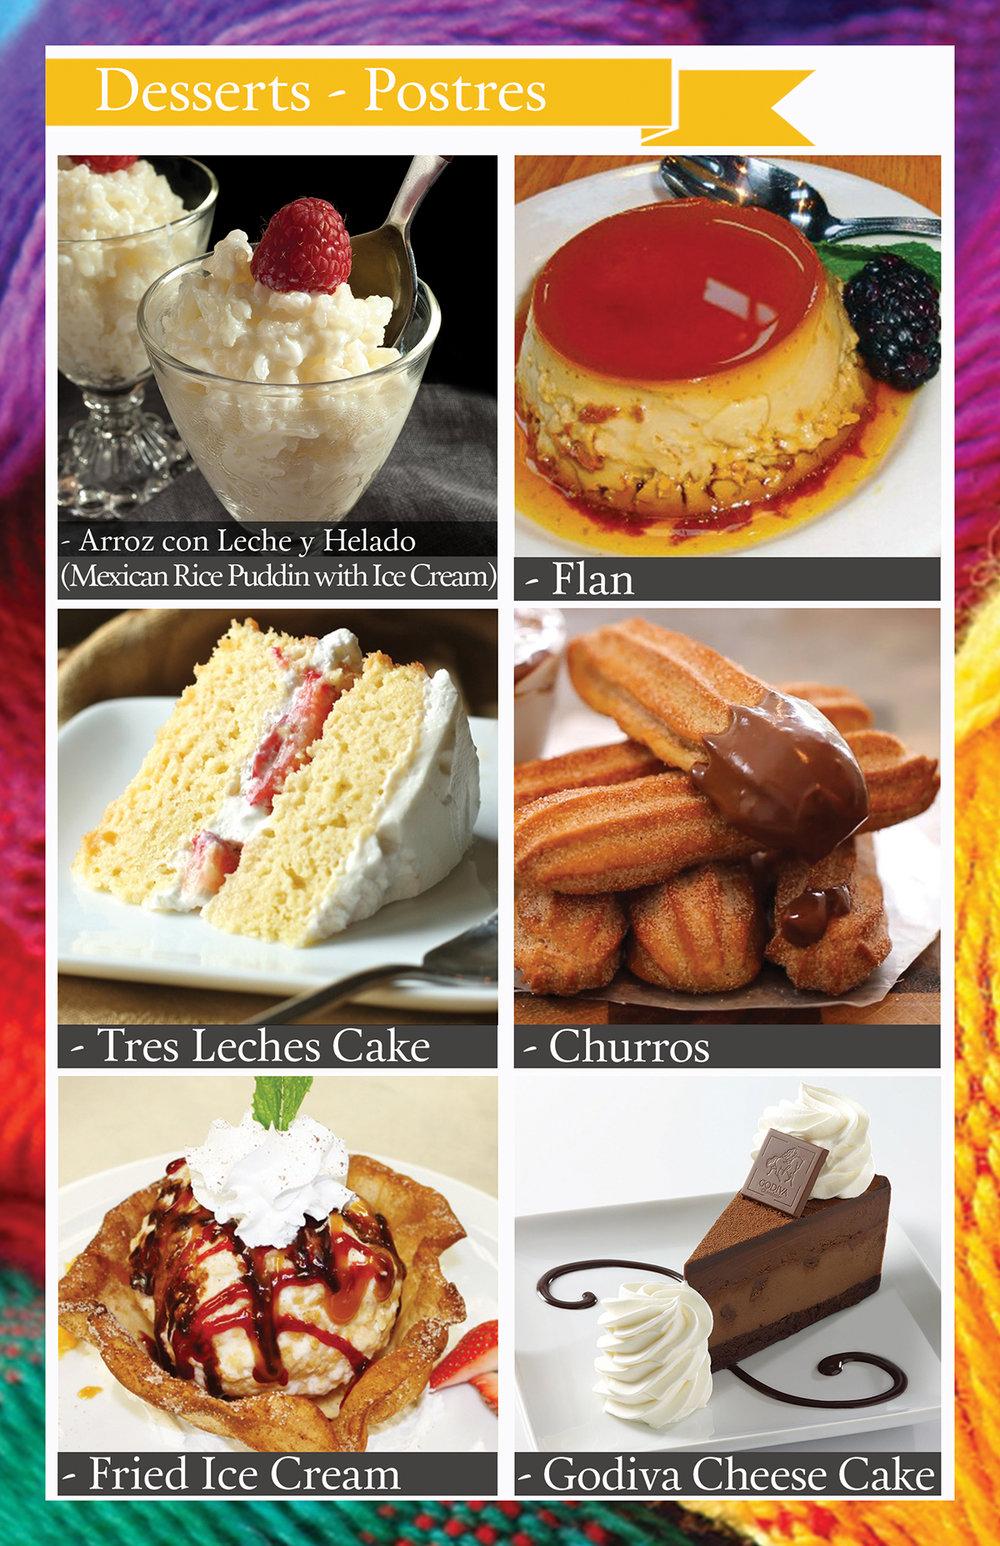 Hector-dessert-Menu-2017-WEB.jpg